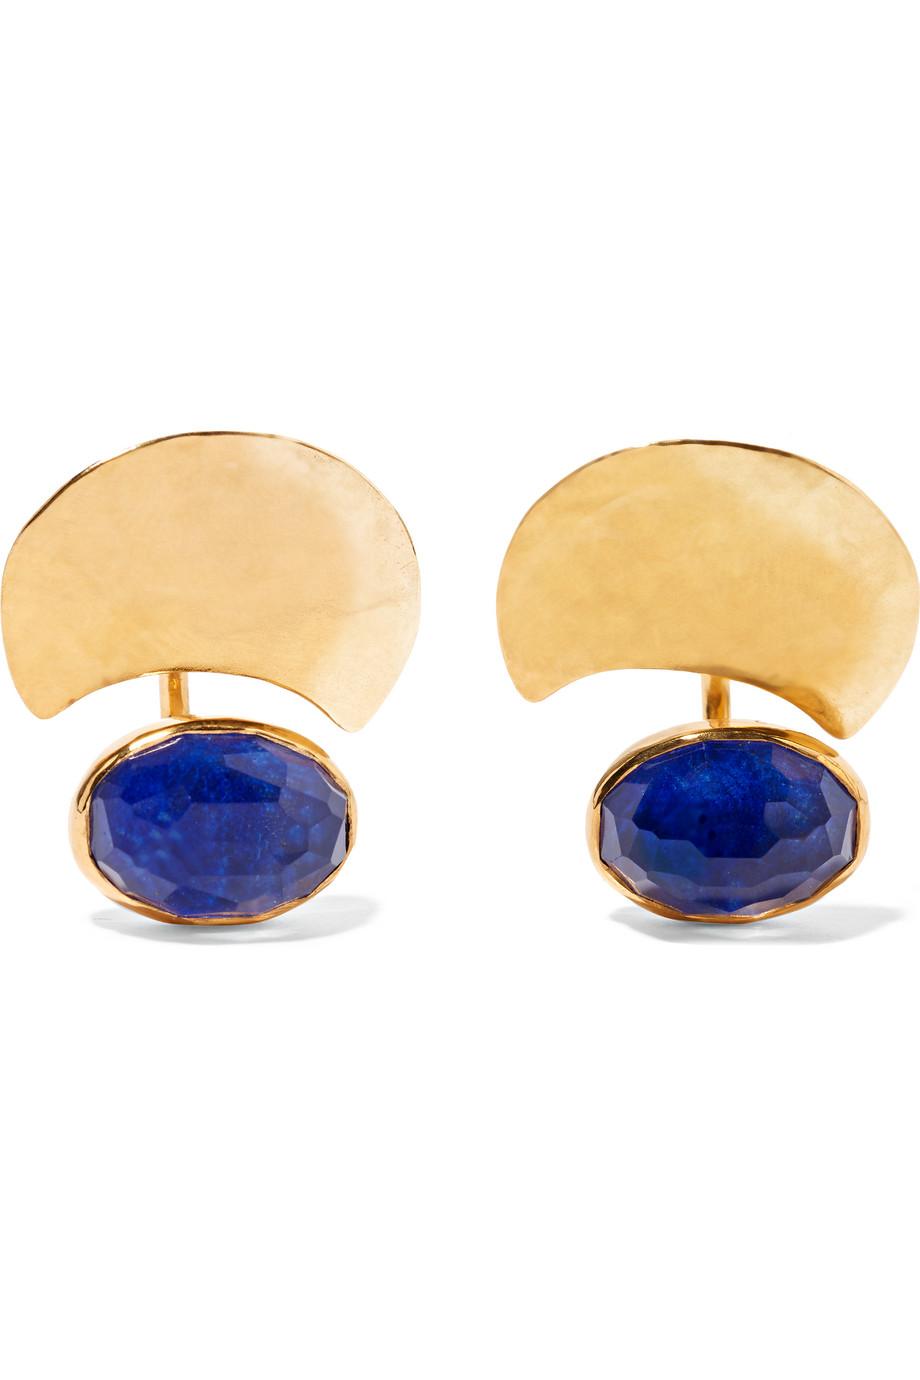 Mezzaluna Gold-Plated Lapis Lazuli Earrings, Blue/Gold, Women's